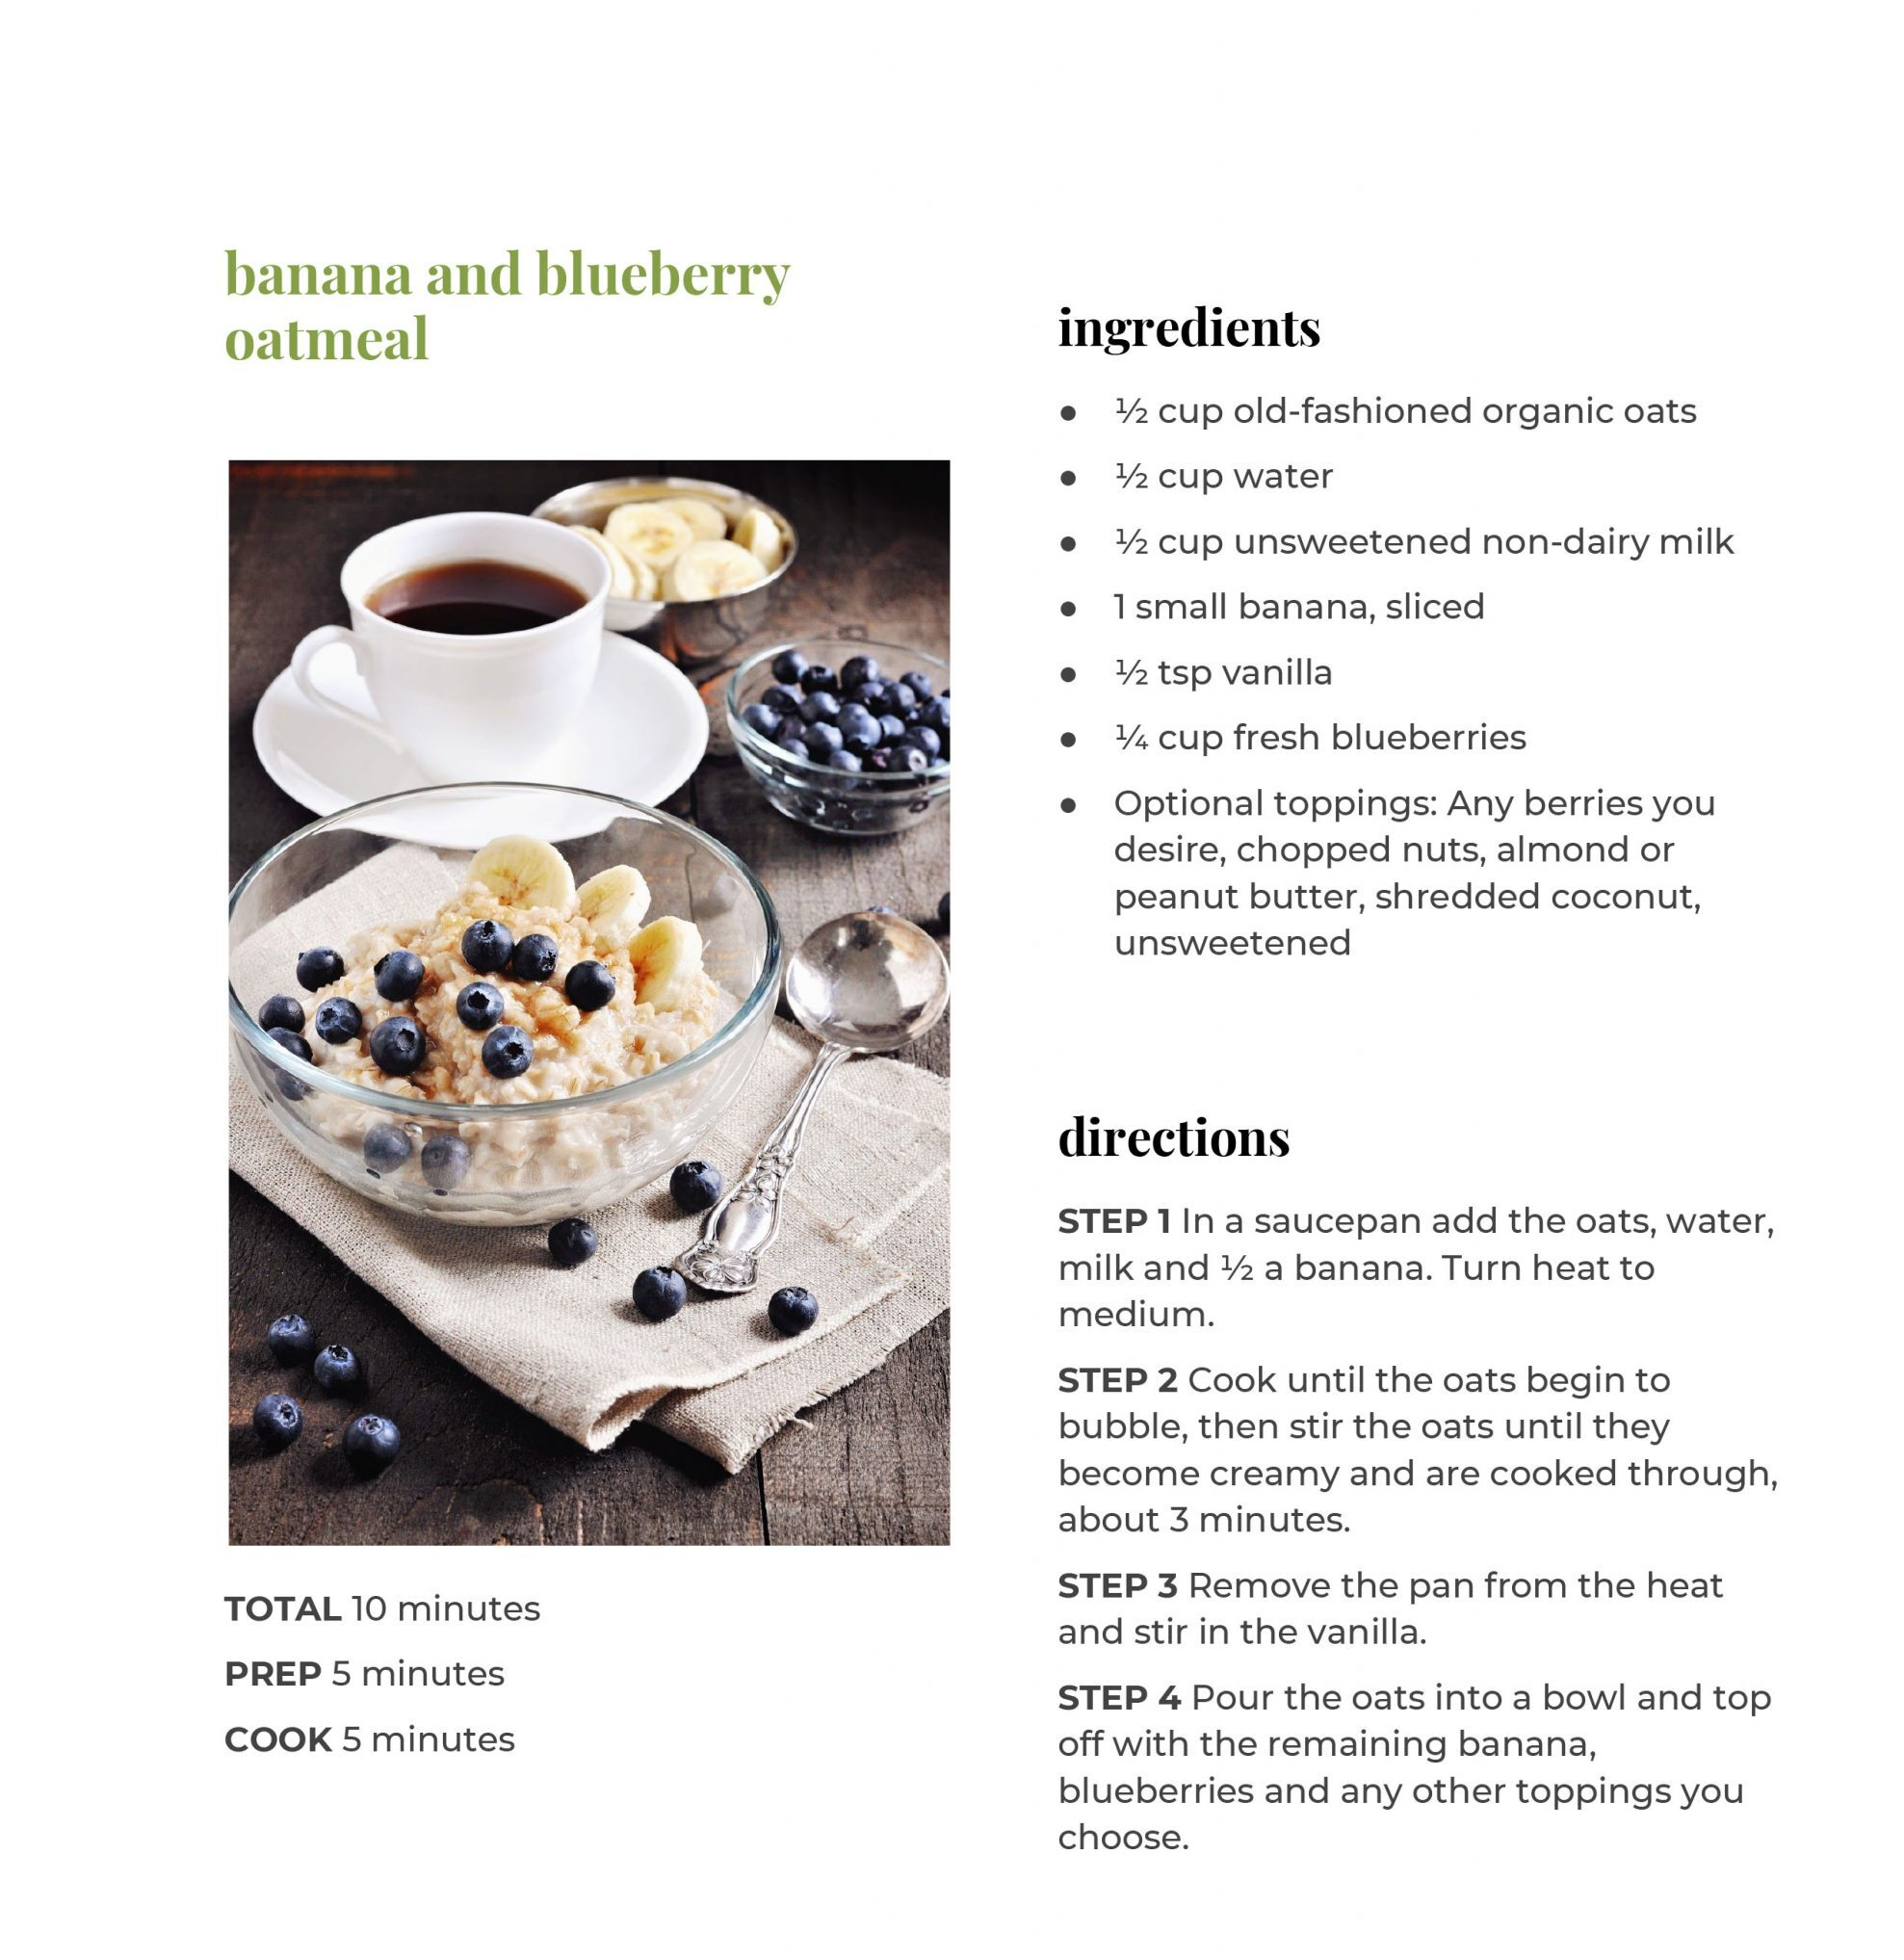 Banana and Blueberry Oatmeal Recipe